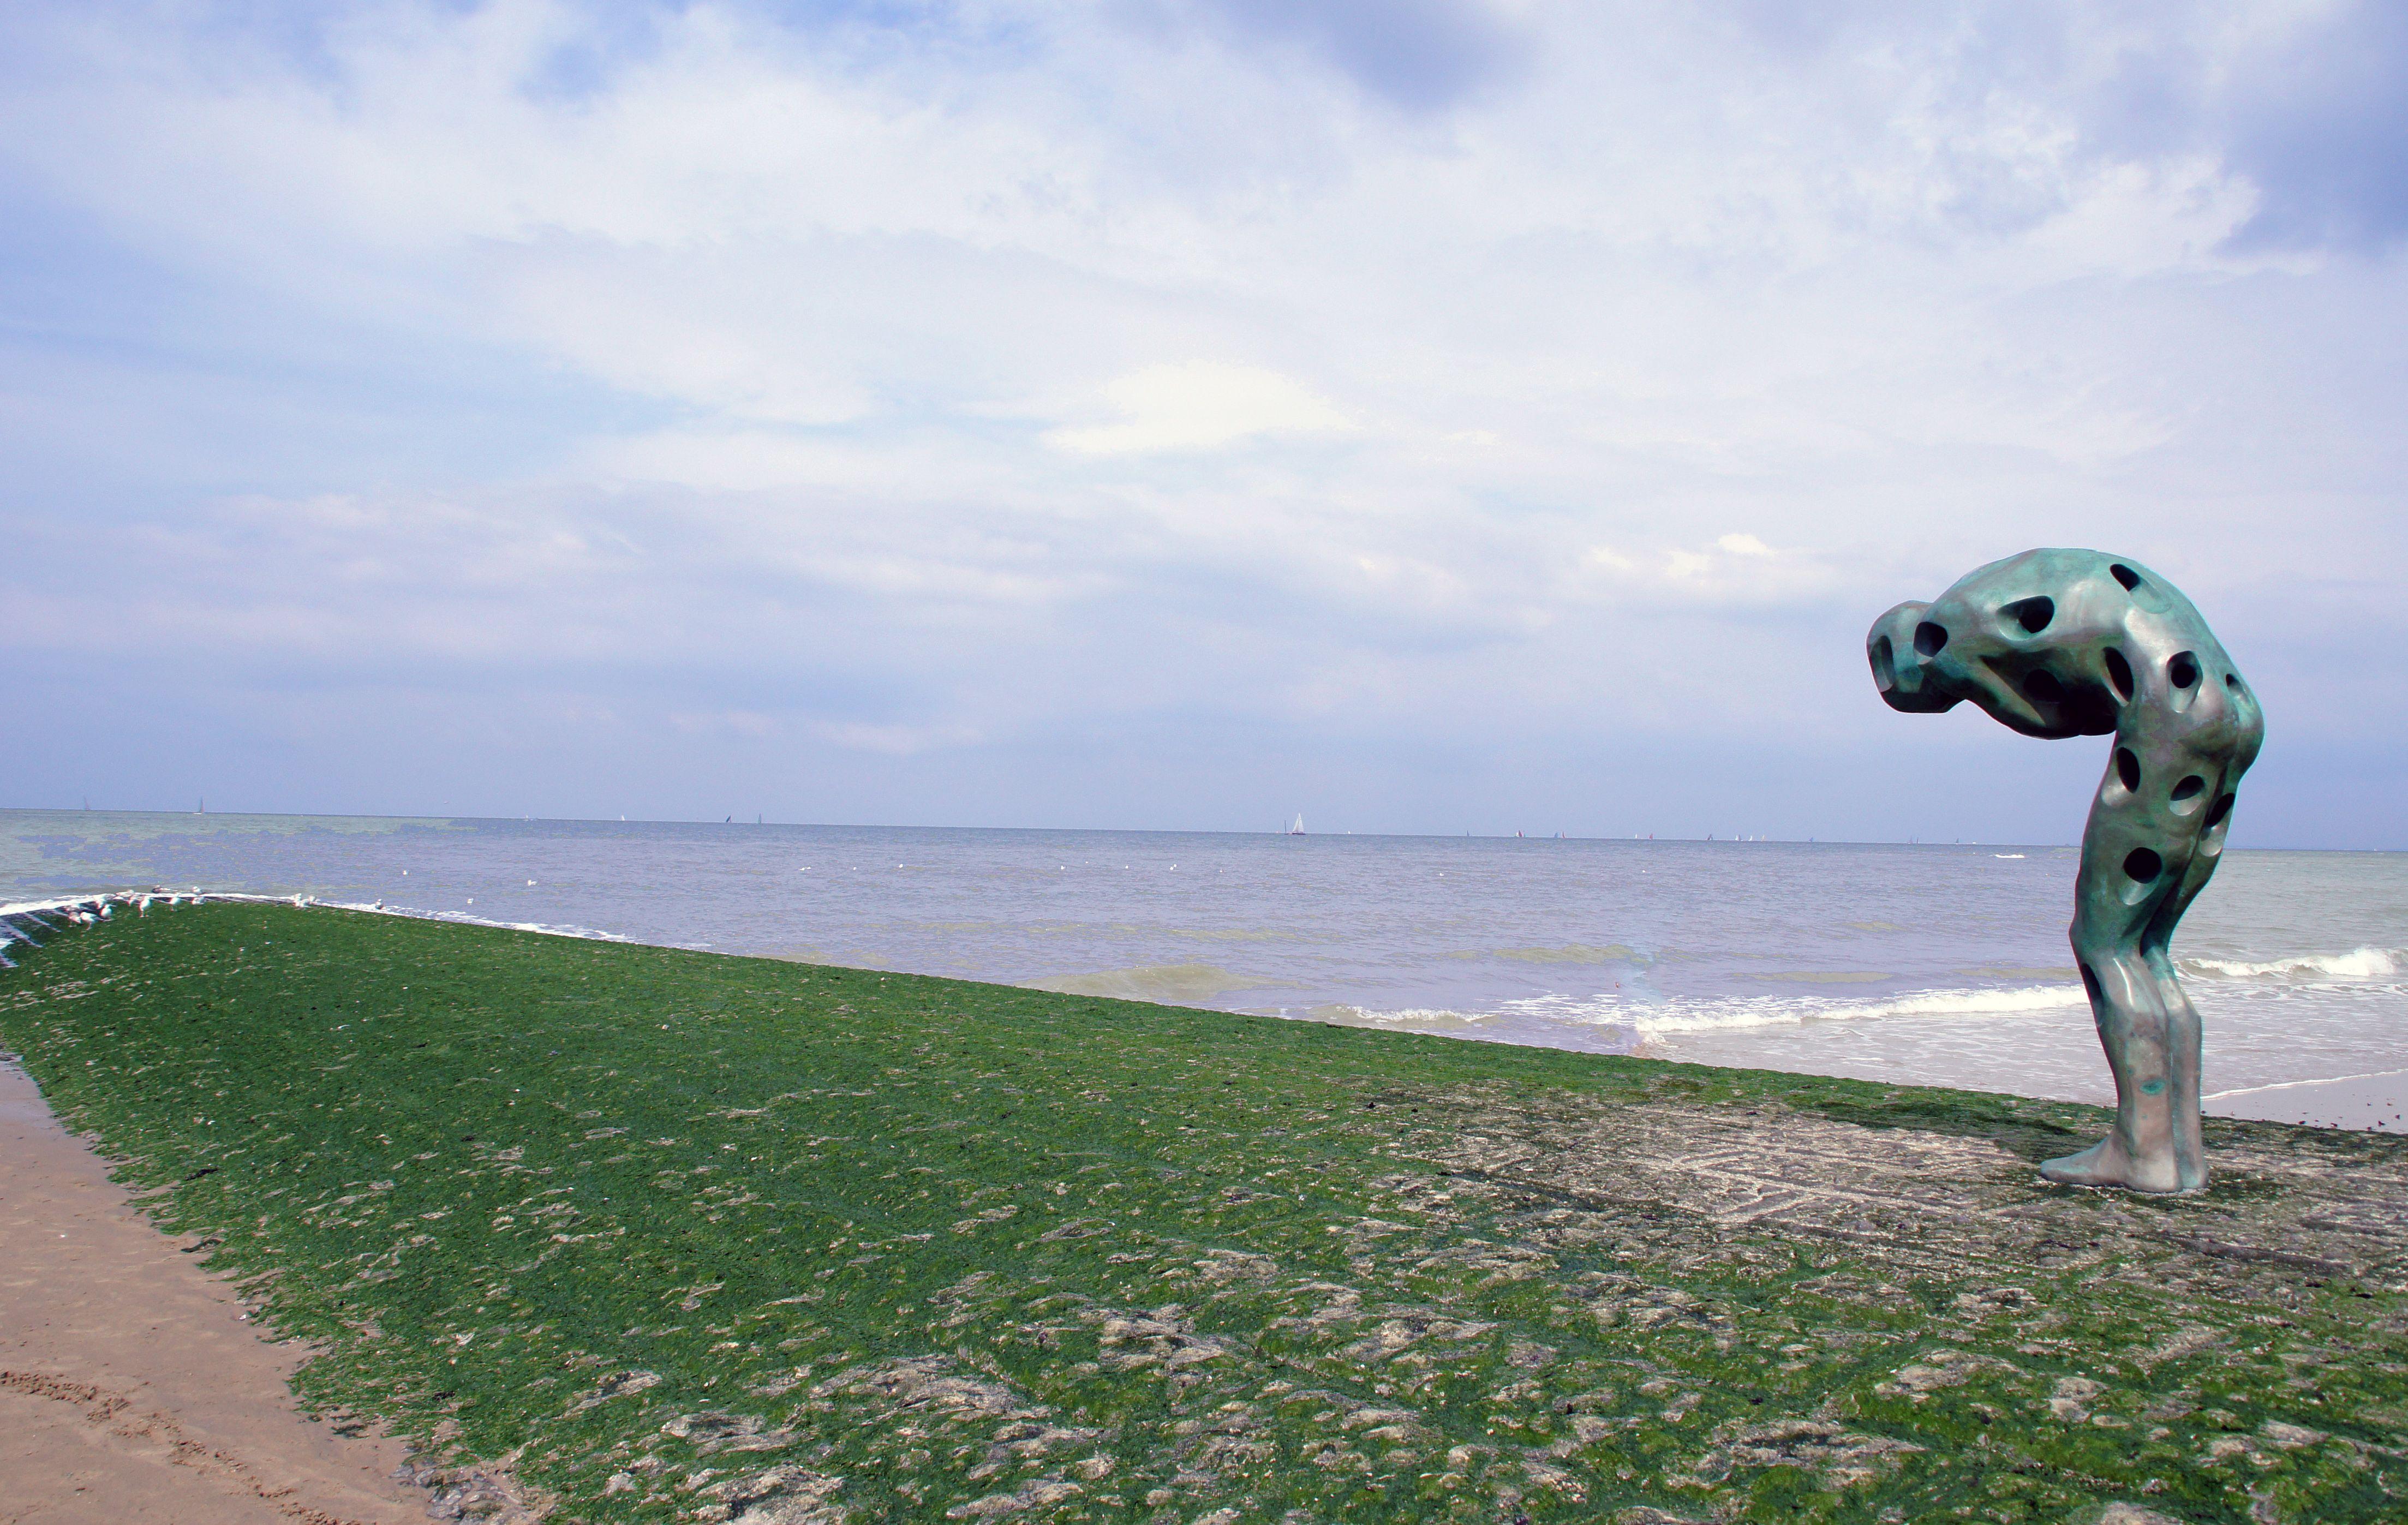 Belgium - Knokke - Beach